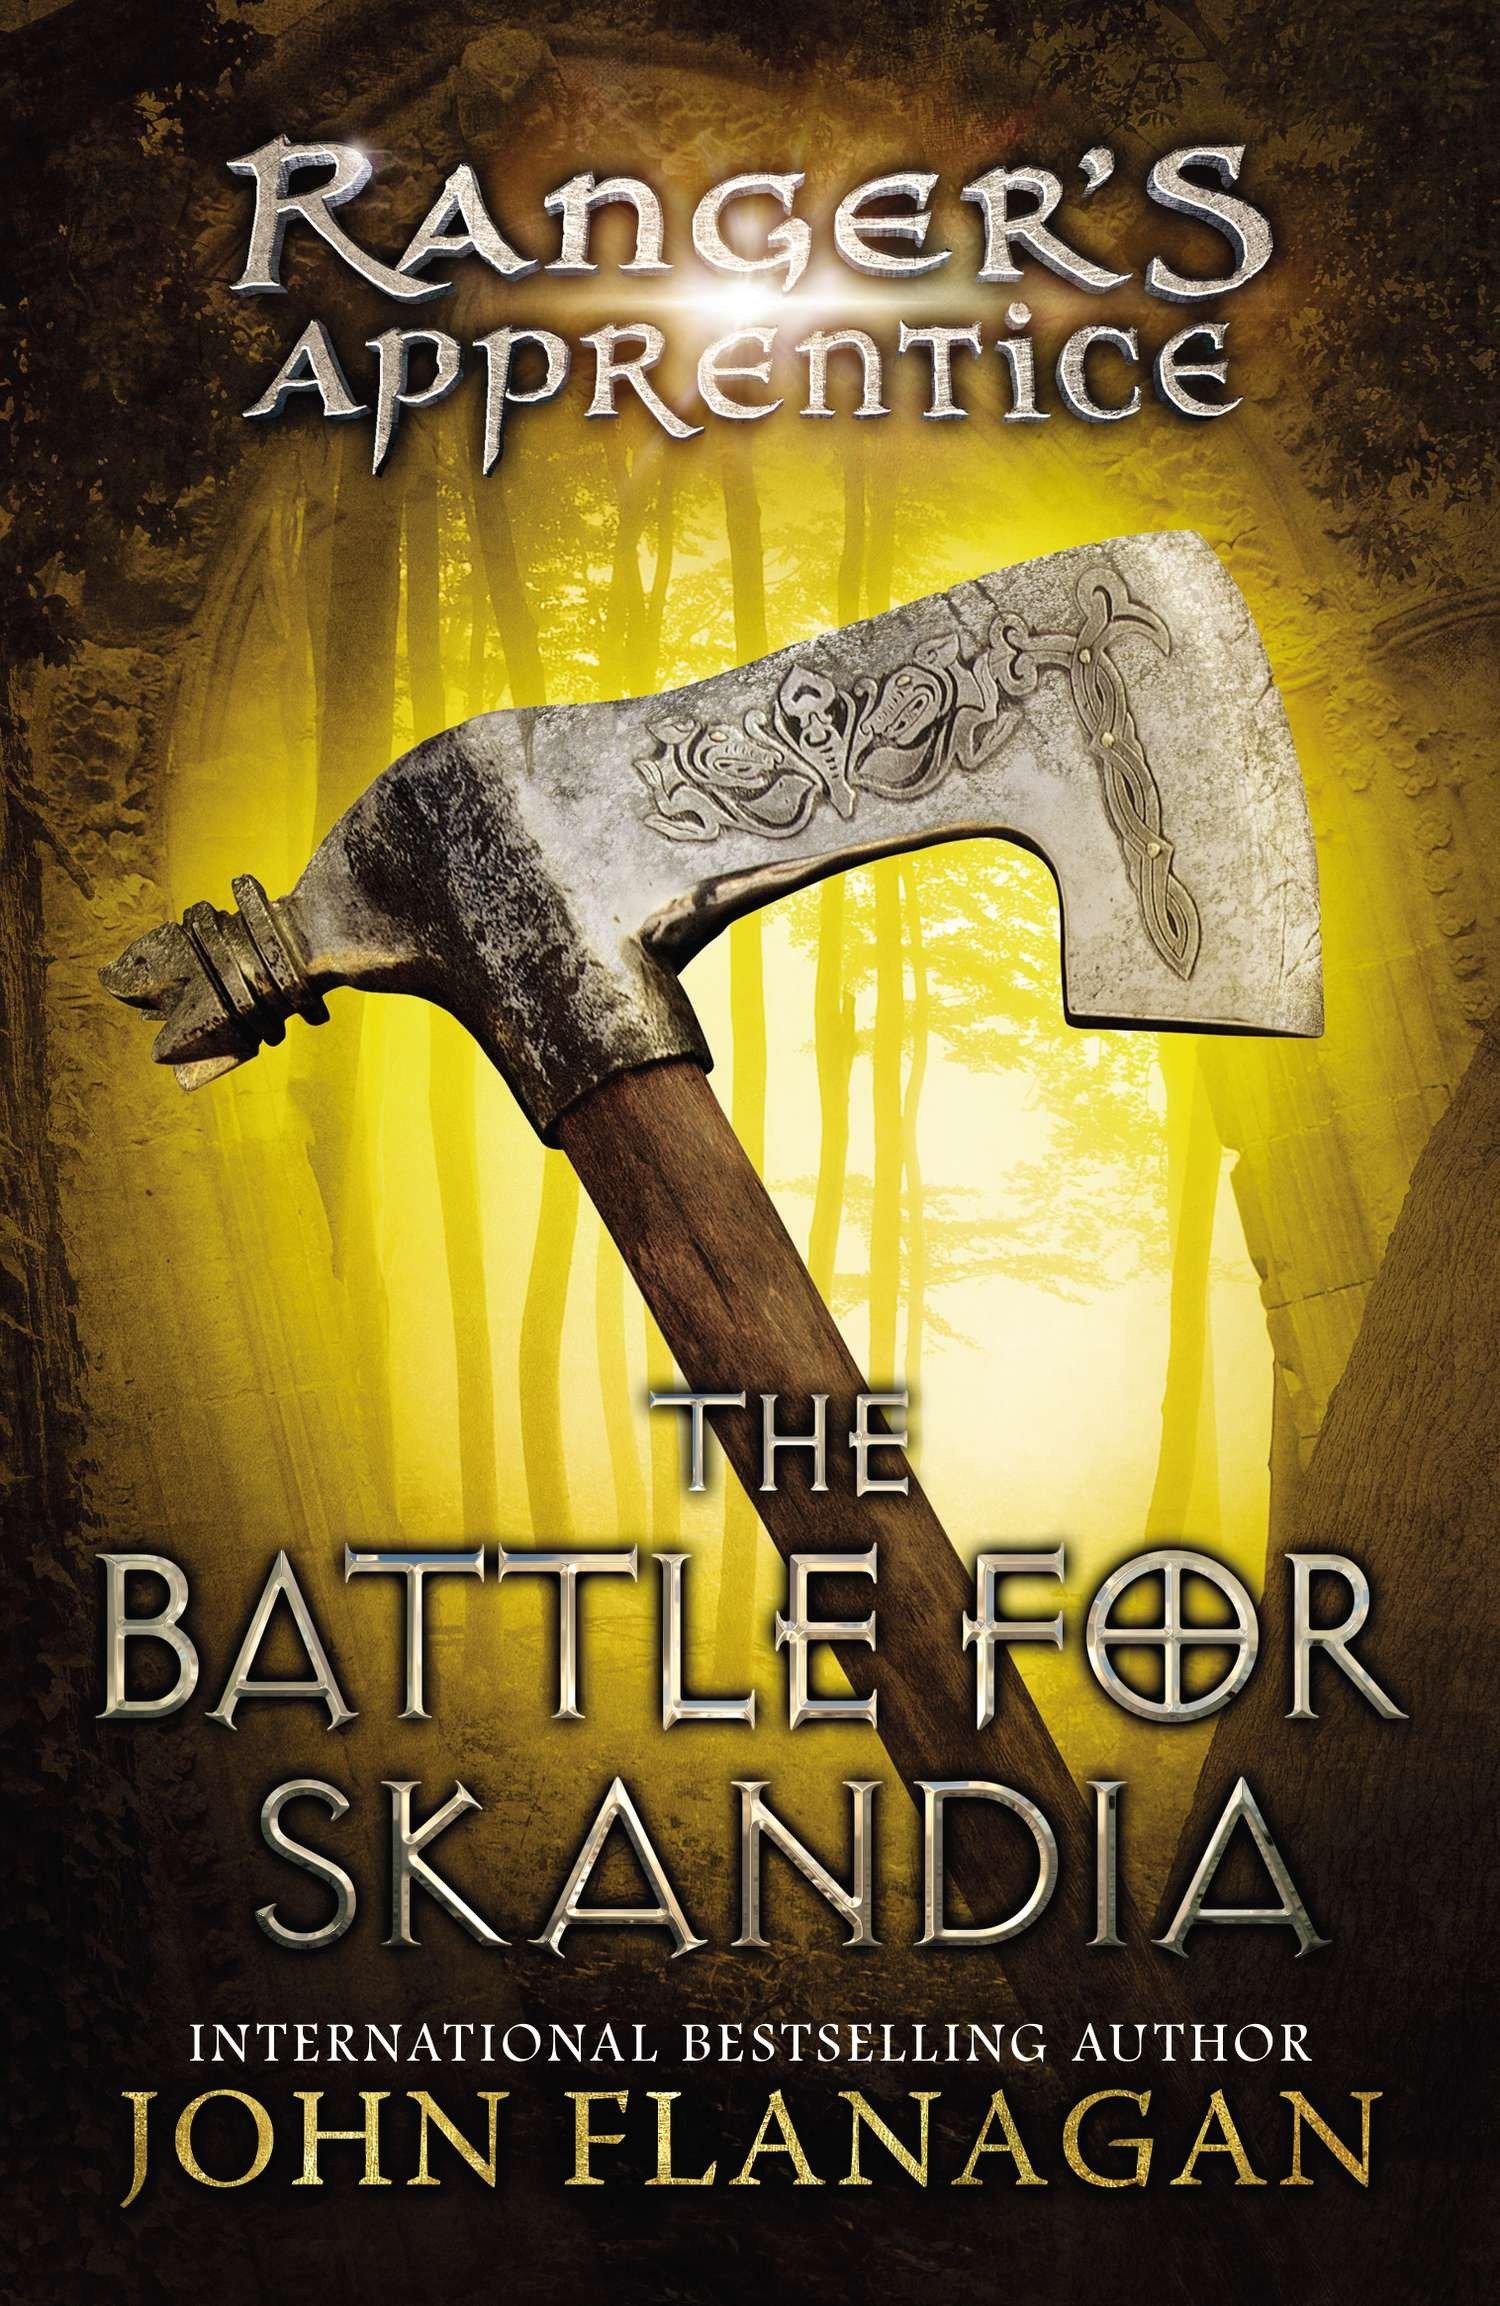 The Battle for Skandia cover image